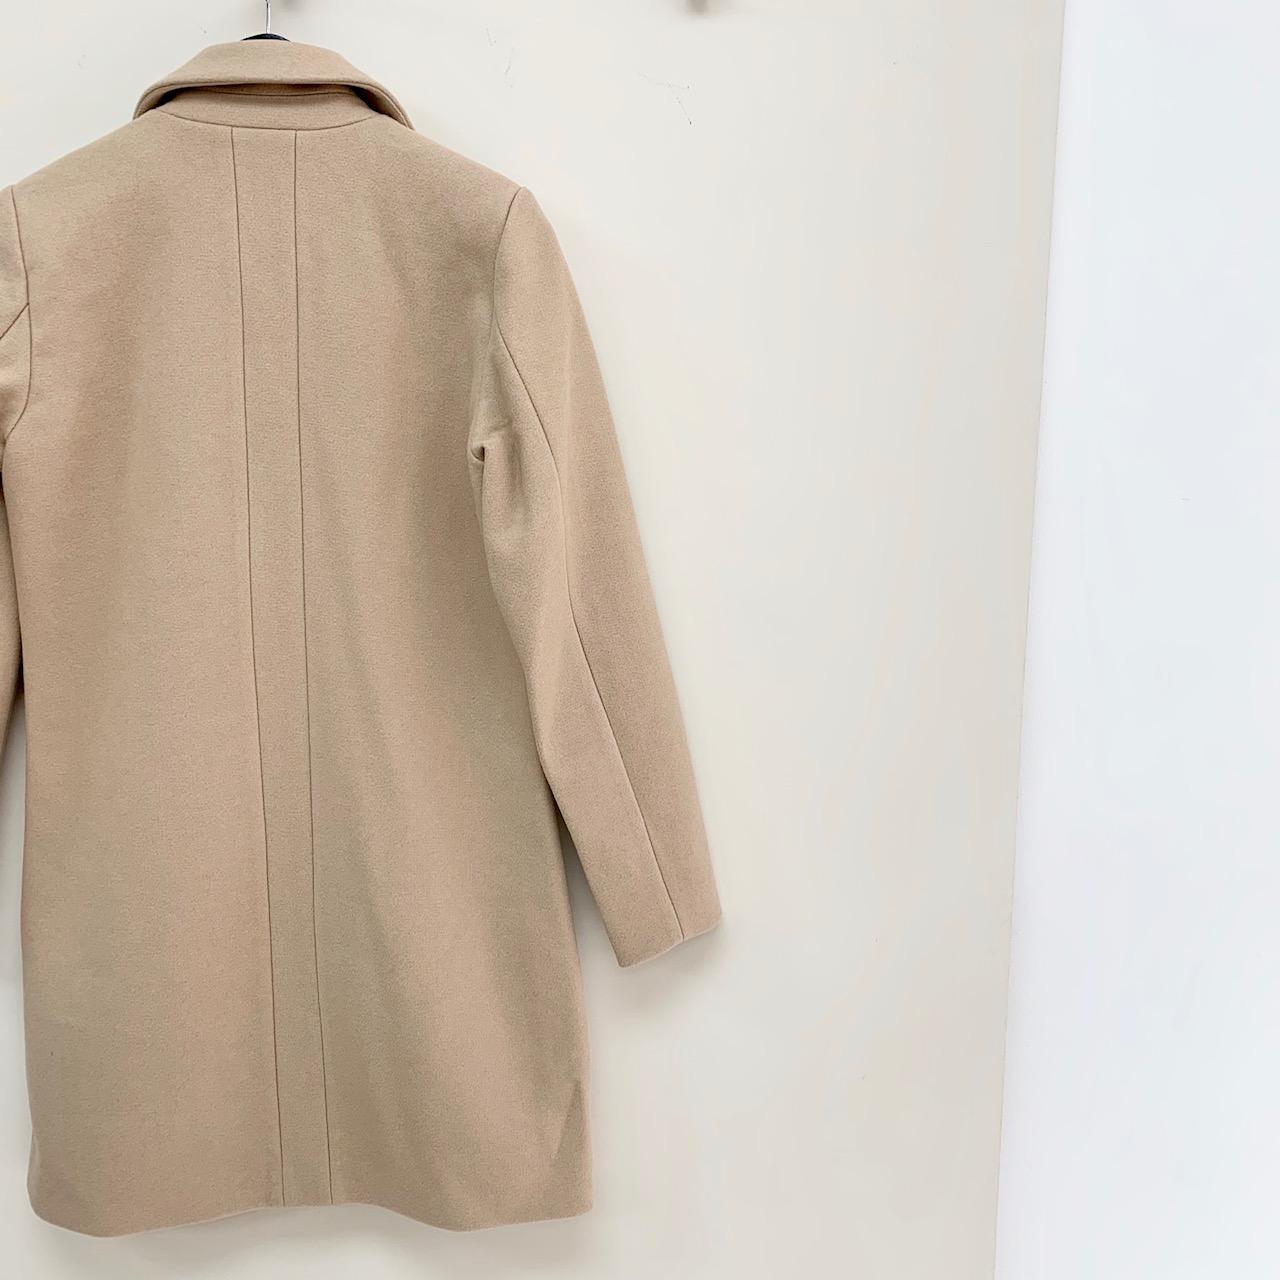 SALE Jannet (Jackson) Jacket - Camel was £84.99